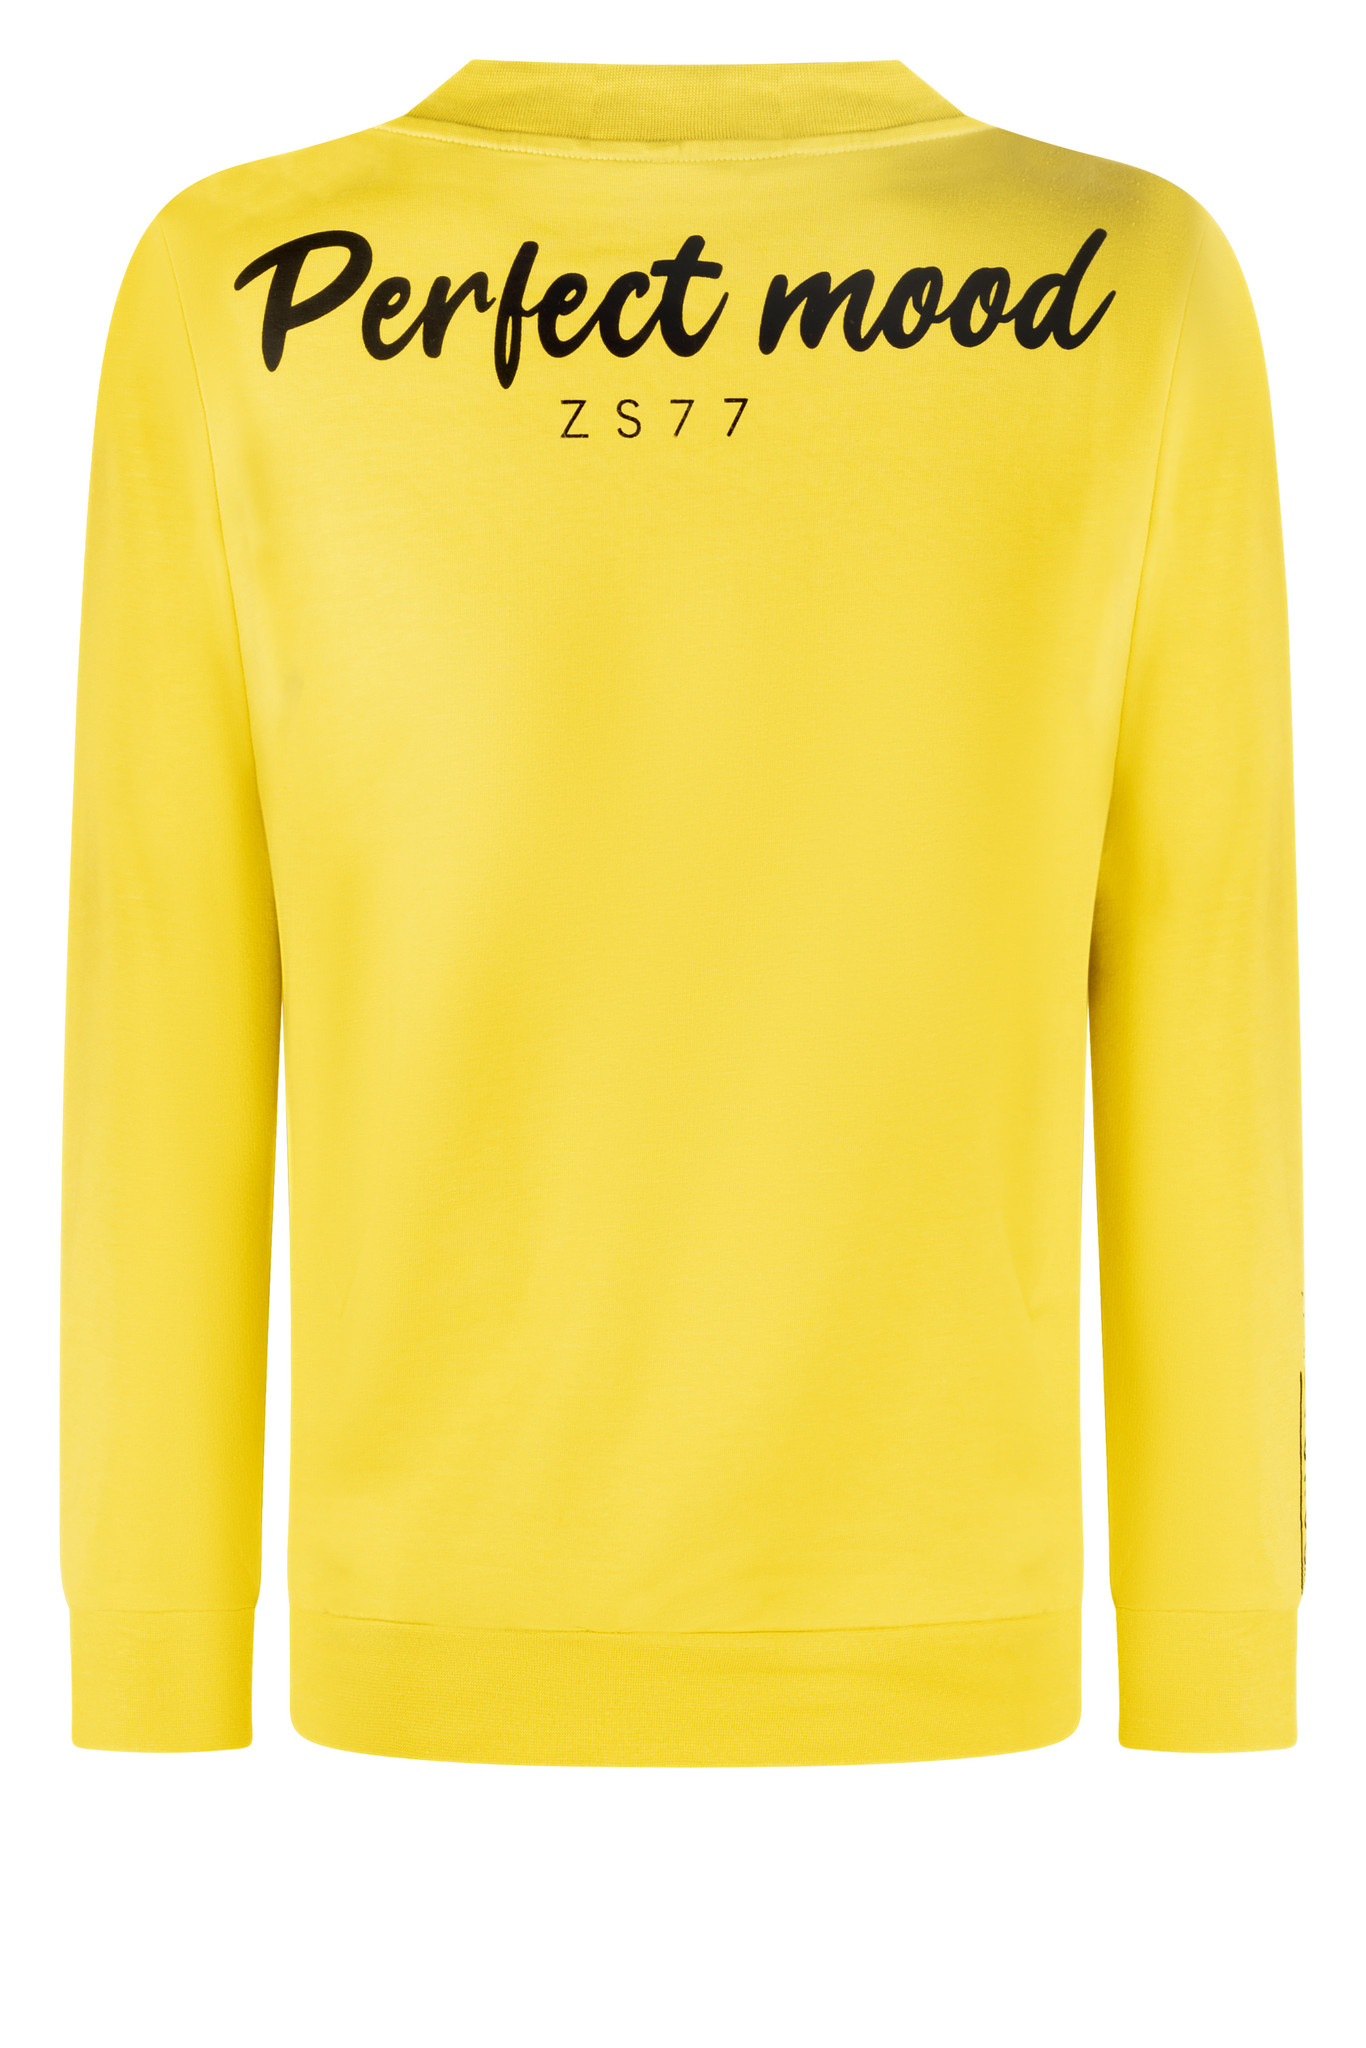 Zoso Zoso  215 Zendra  Zipper sweater with spice  yellow/black